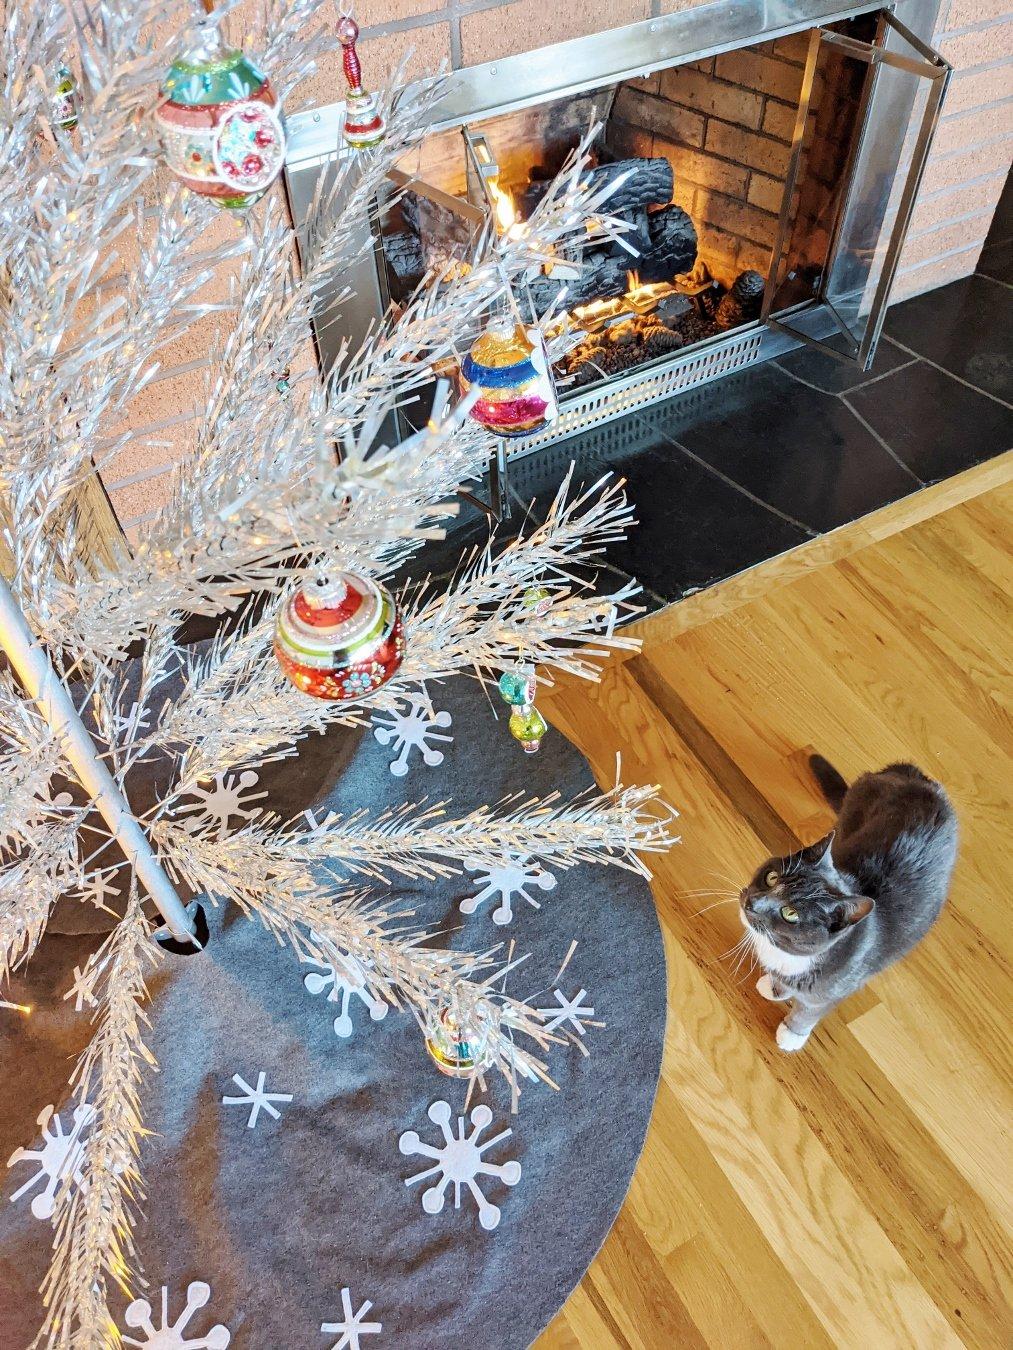 Gray kitty looking at Shiny Brite ornaments on aluminum Christmas tree